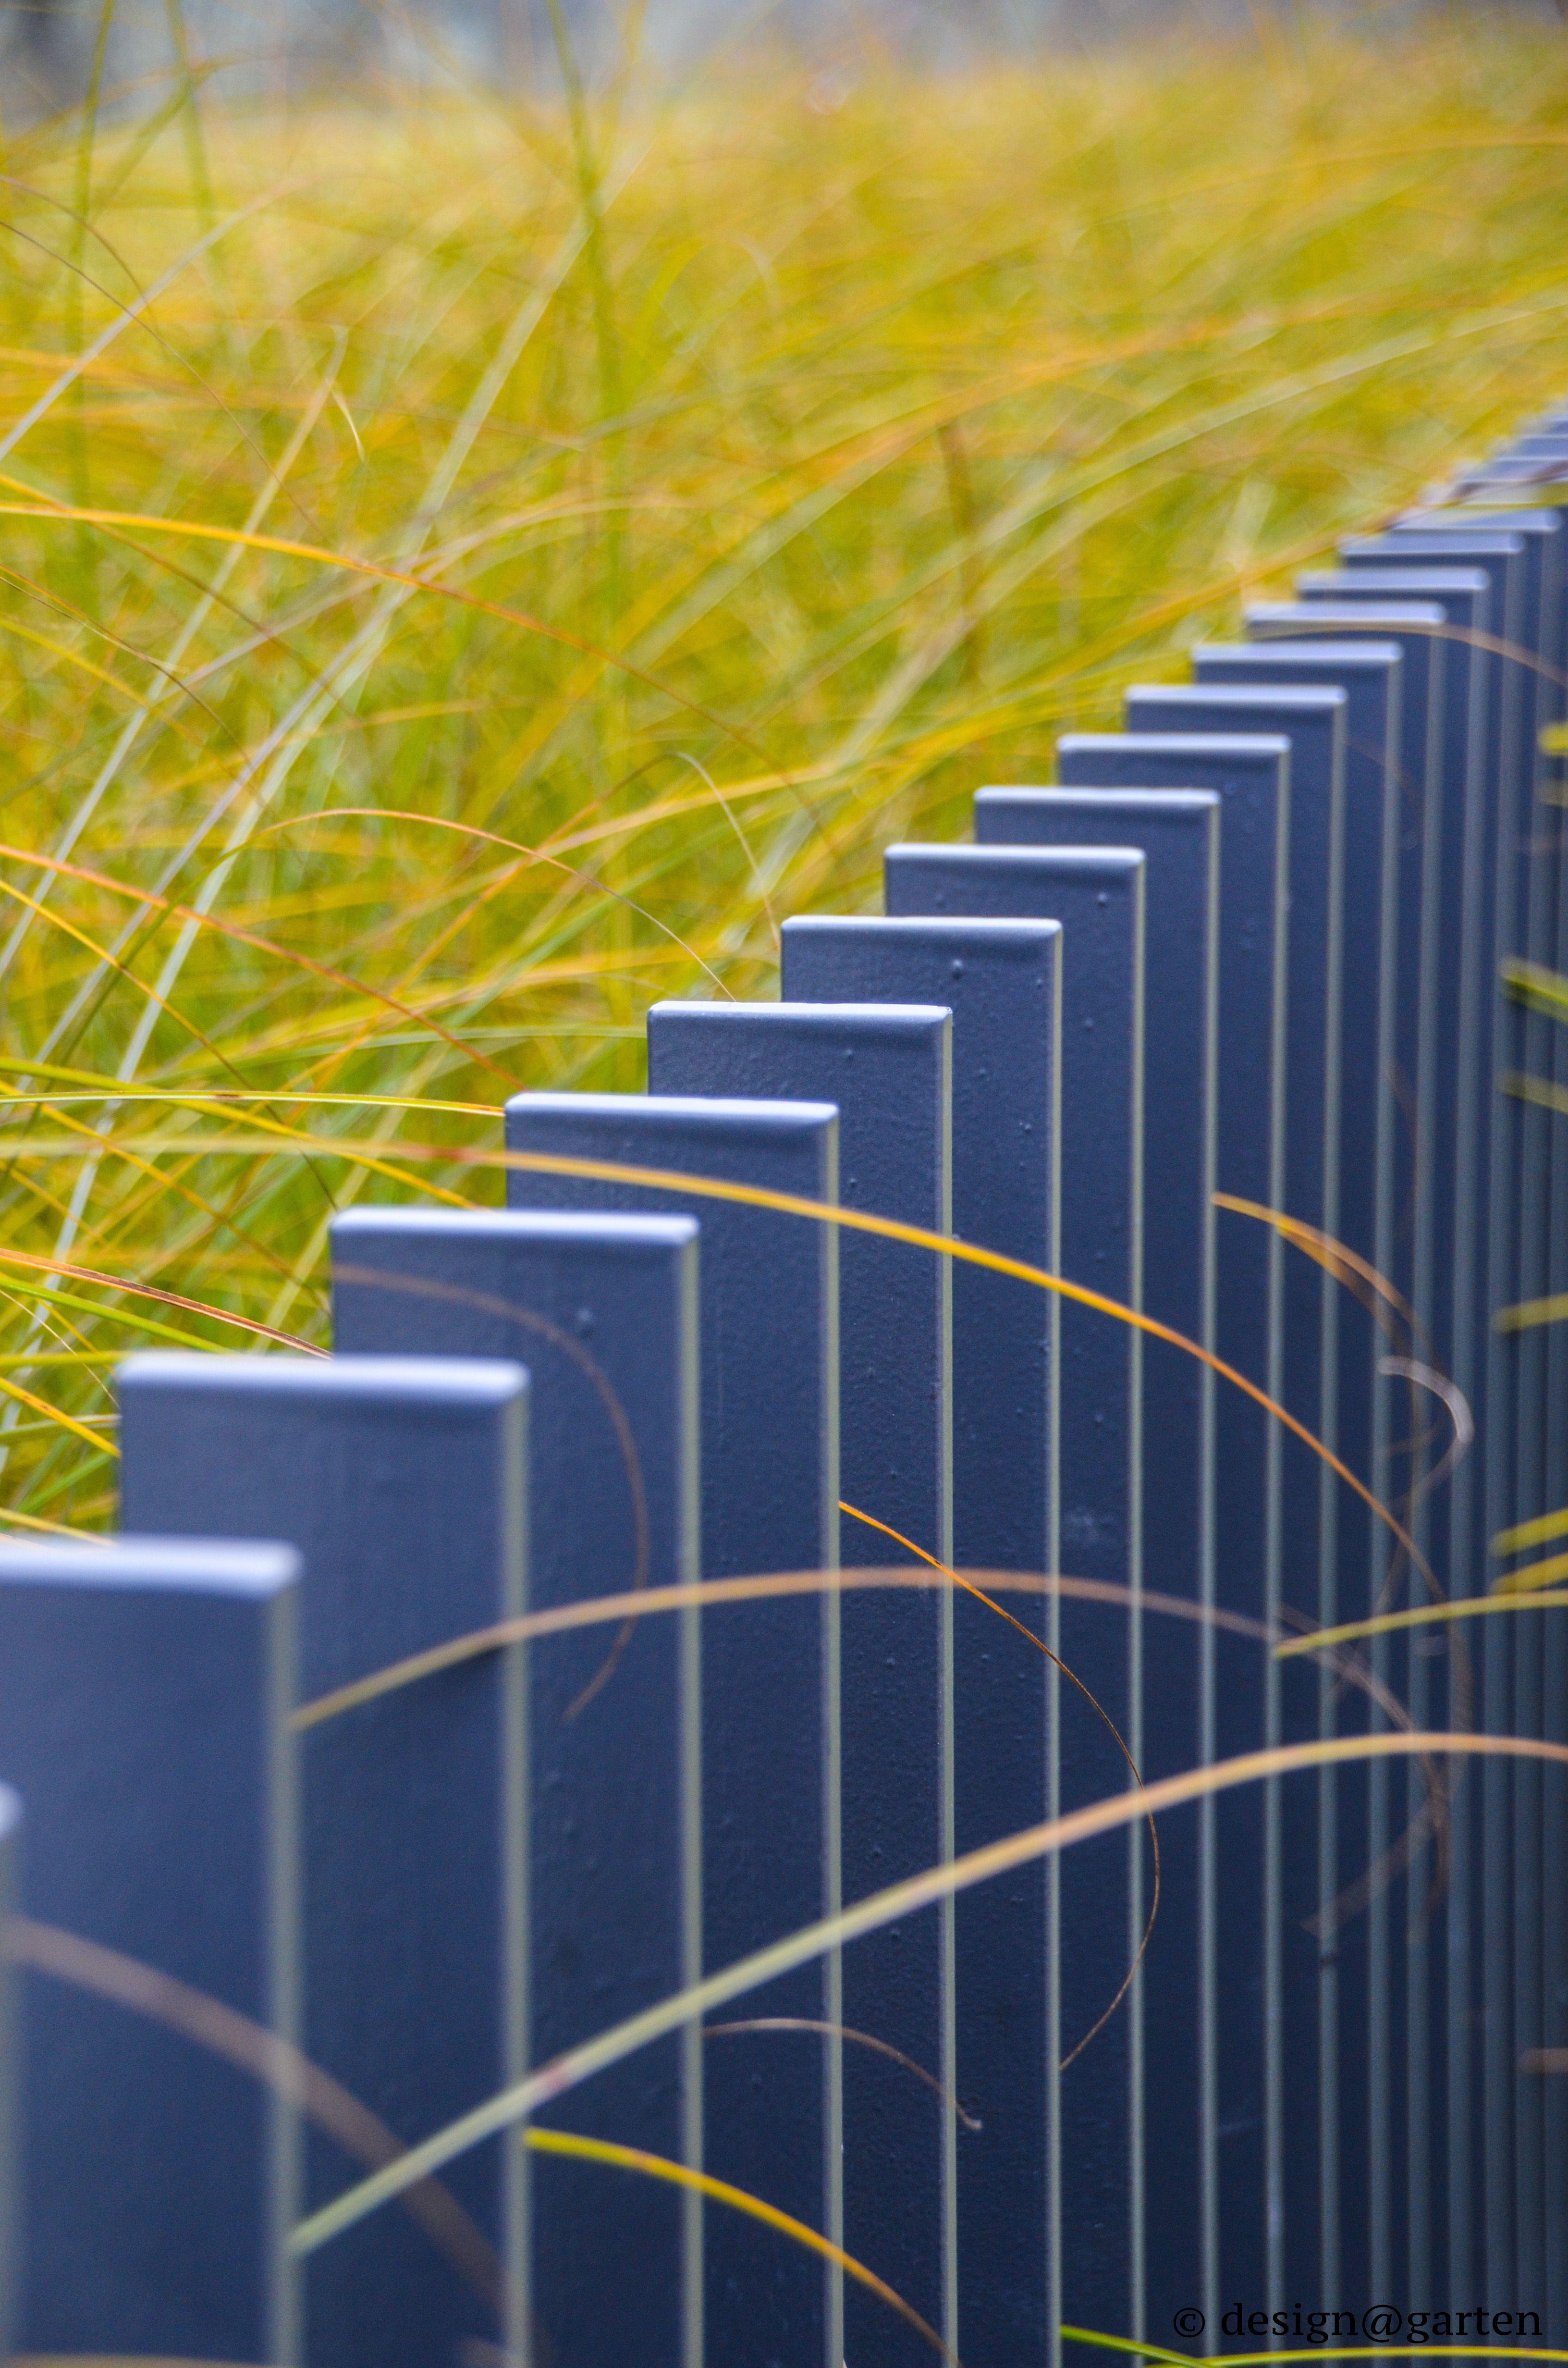 design garden fence design gartenzaun design. Black Bedroom Furniture Sets. Home Design Ideas